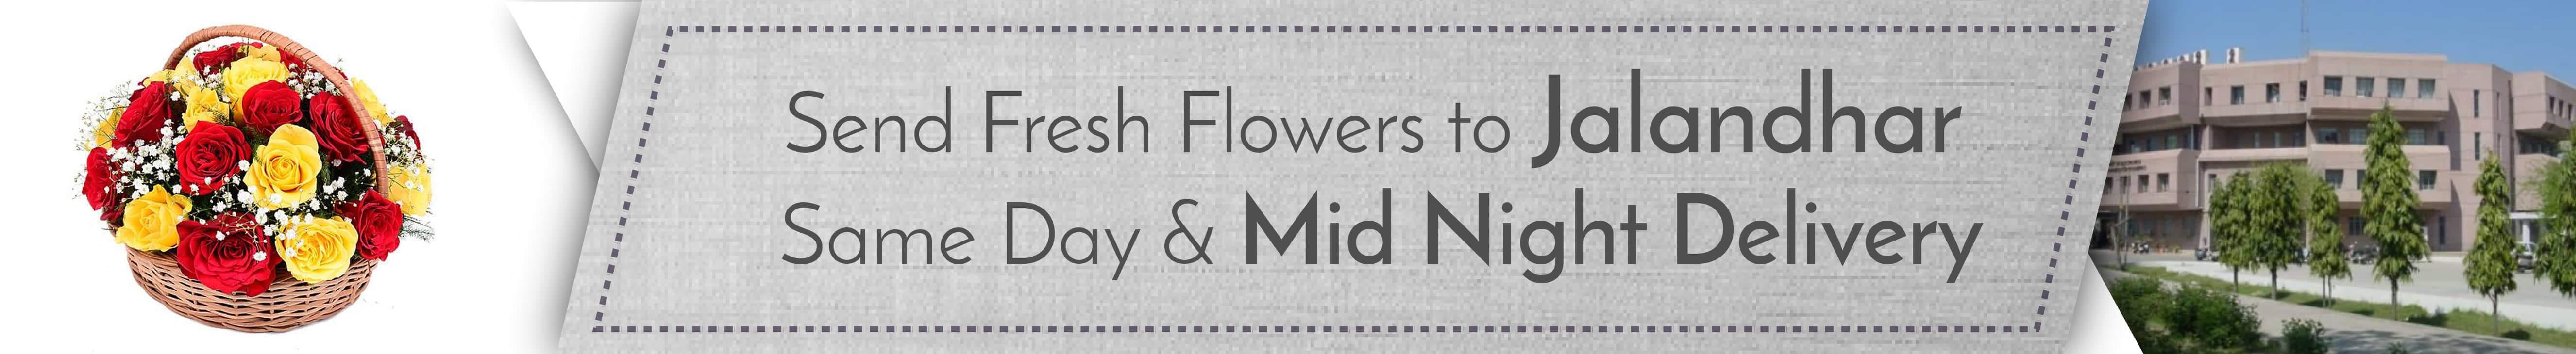 Flowers Jalandhar